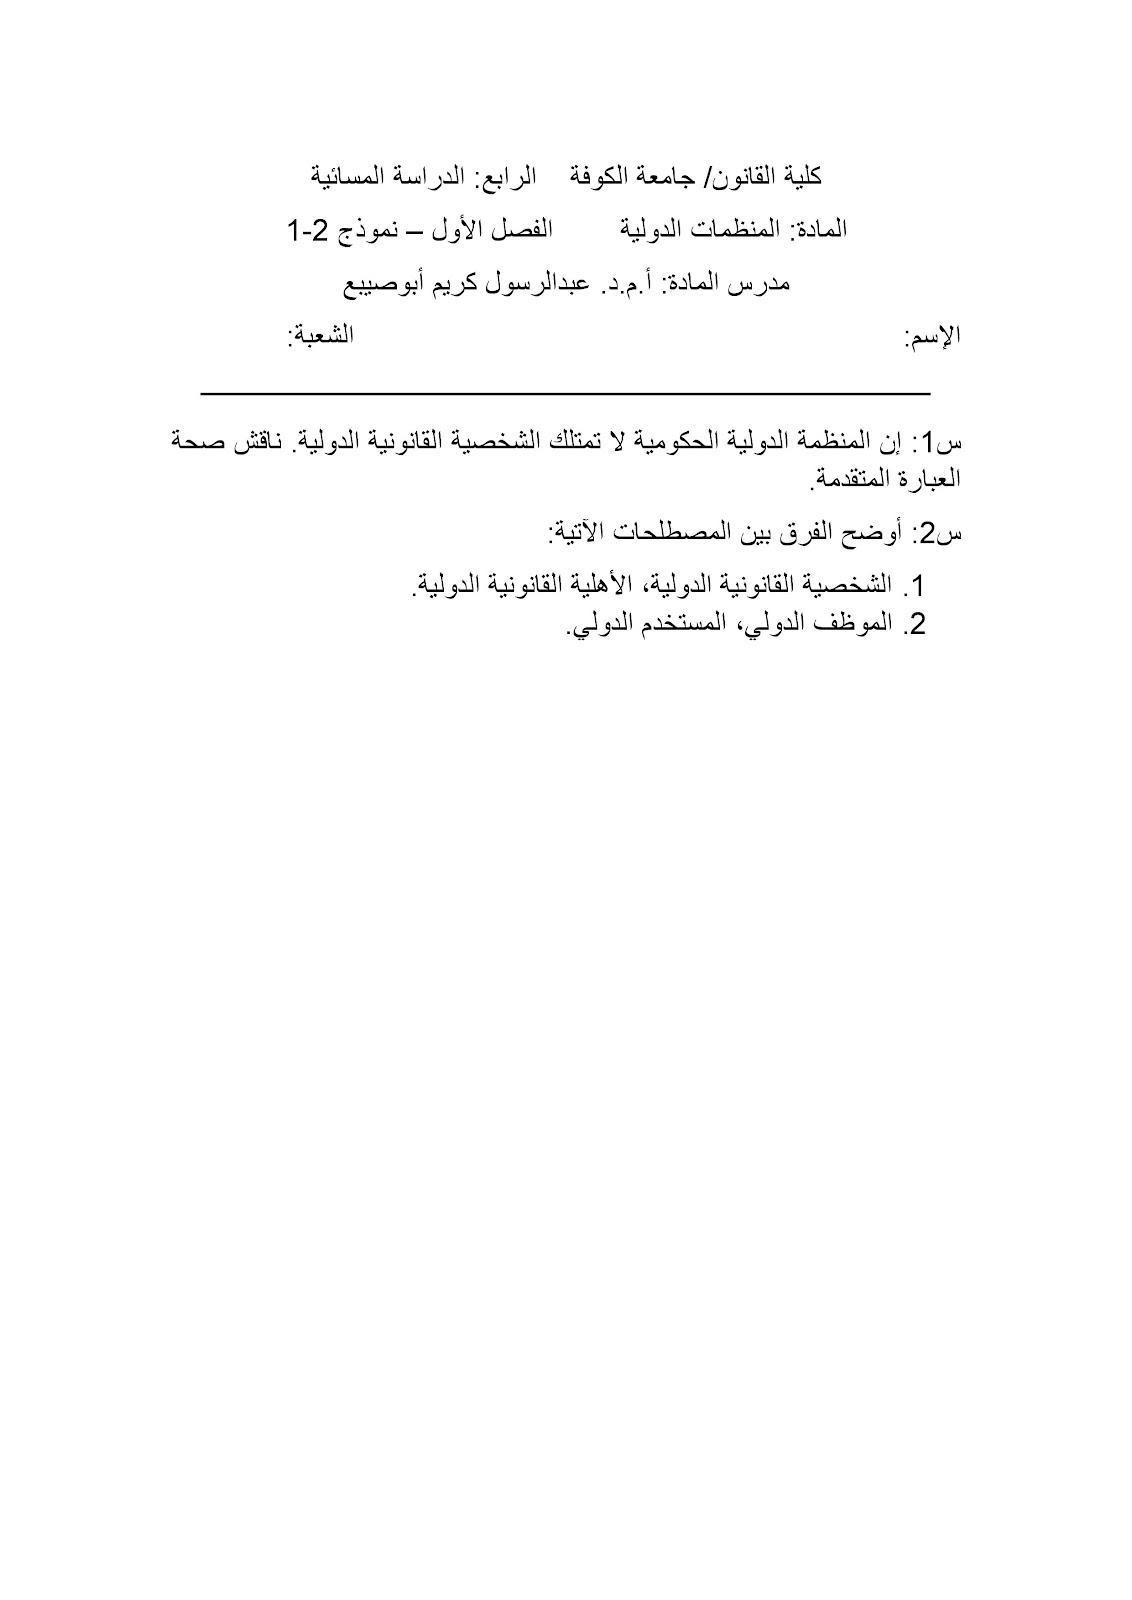 10.page1.jpg